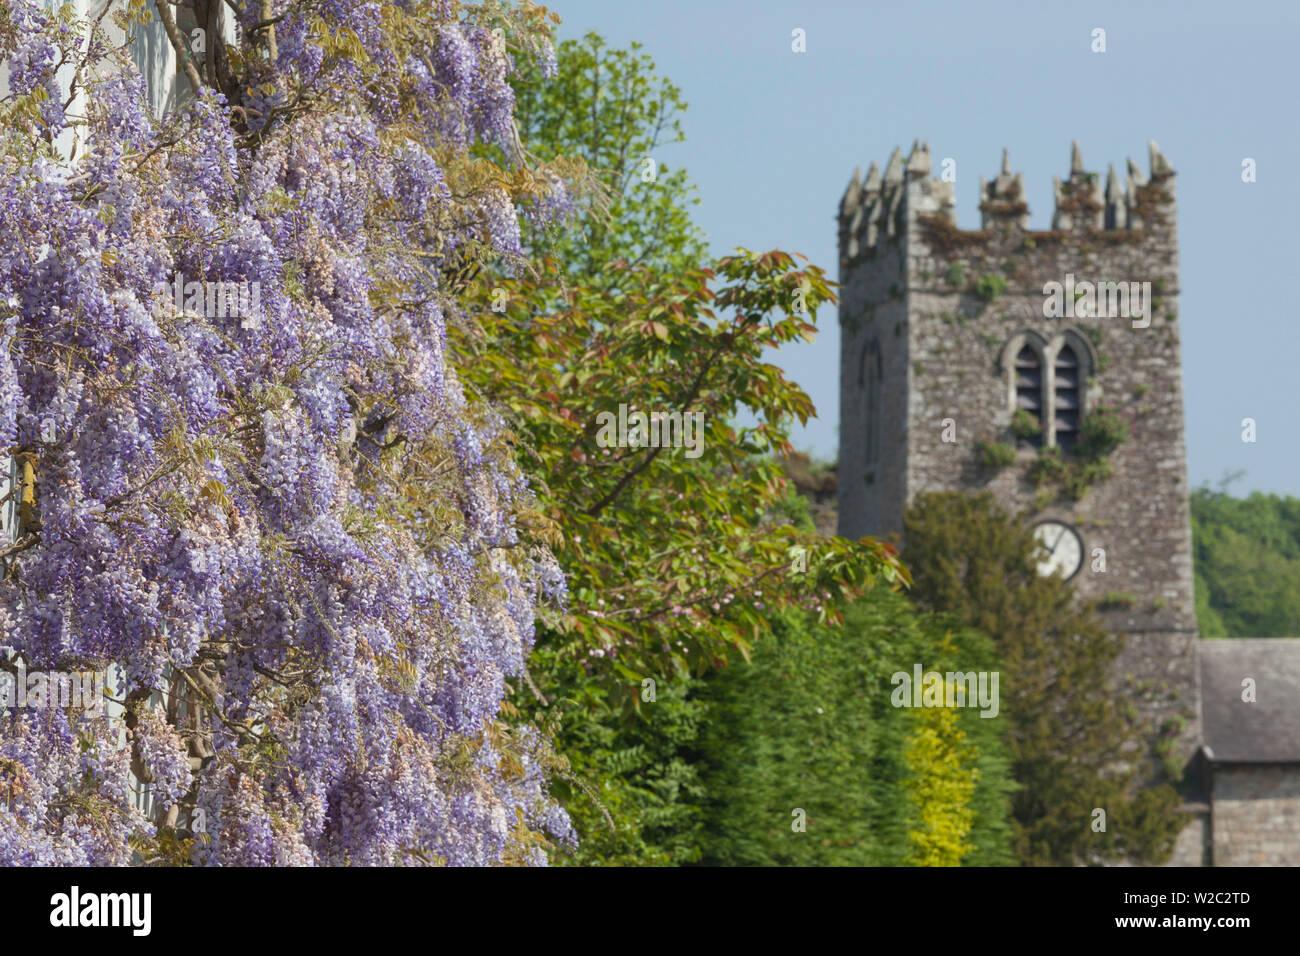 Ireland, County Kilkenny, Inistioge, flower covered house - Stock Image